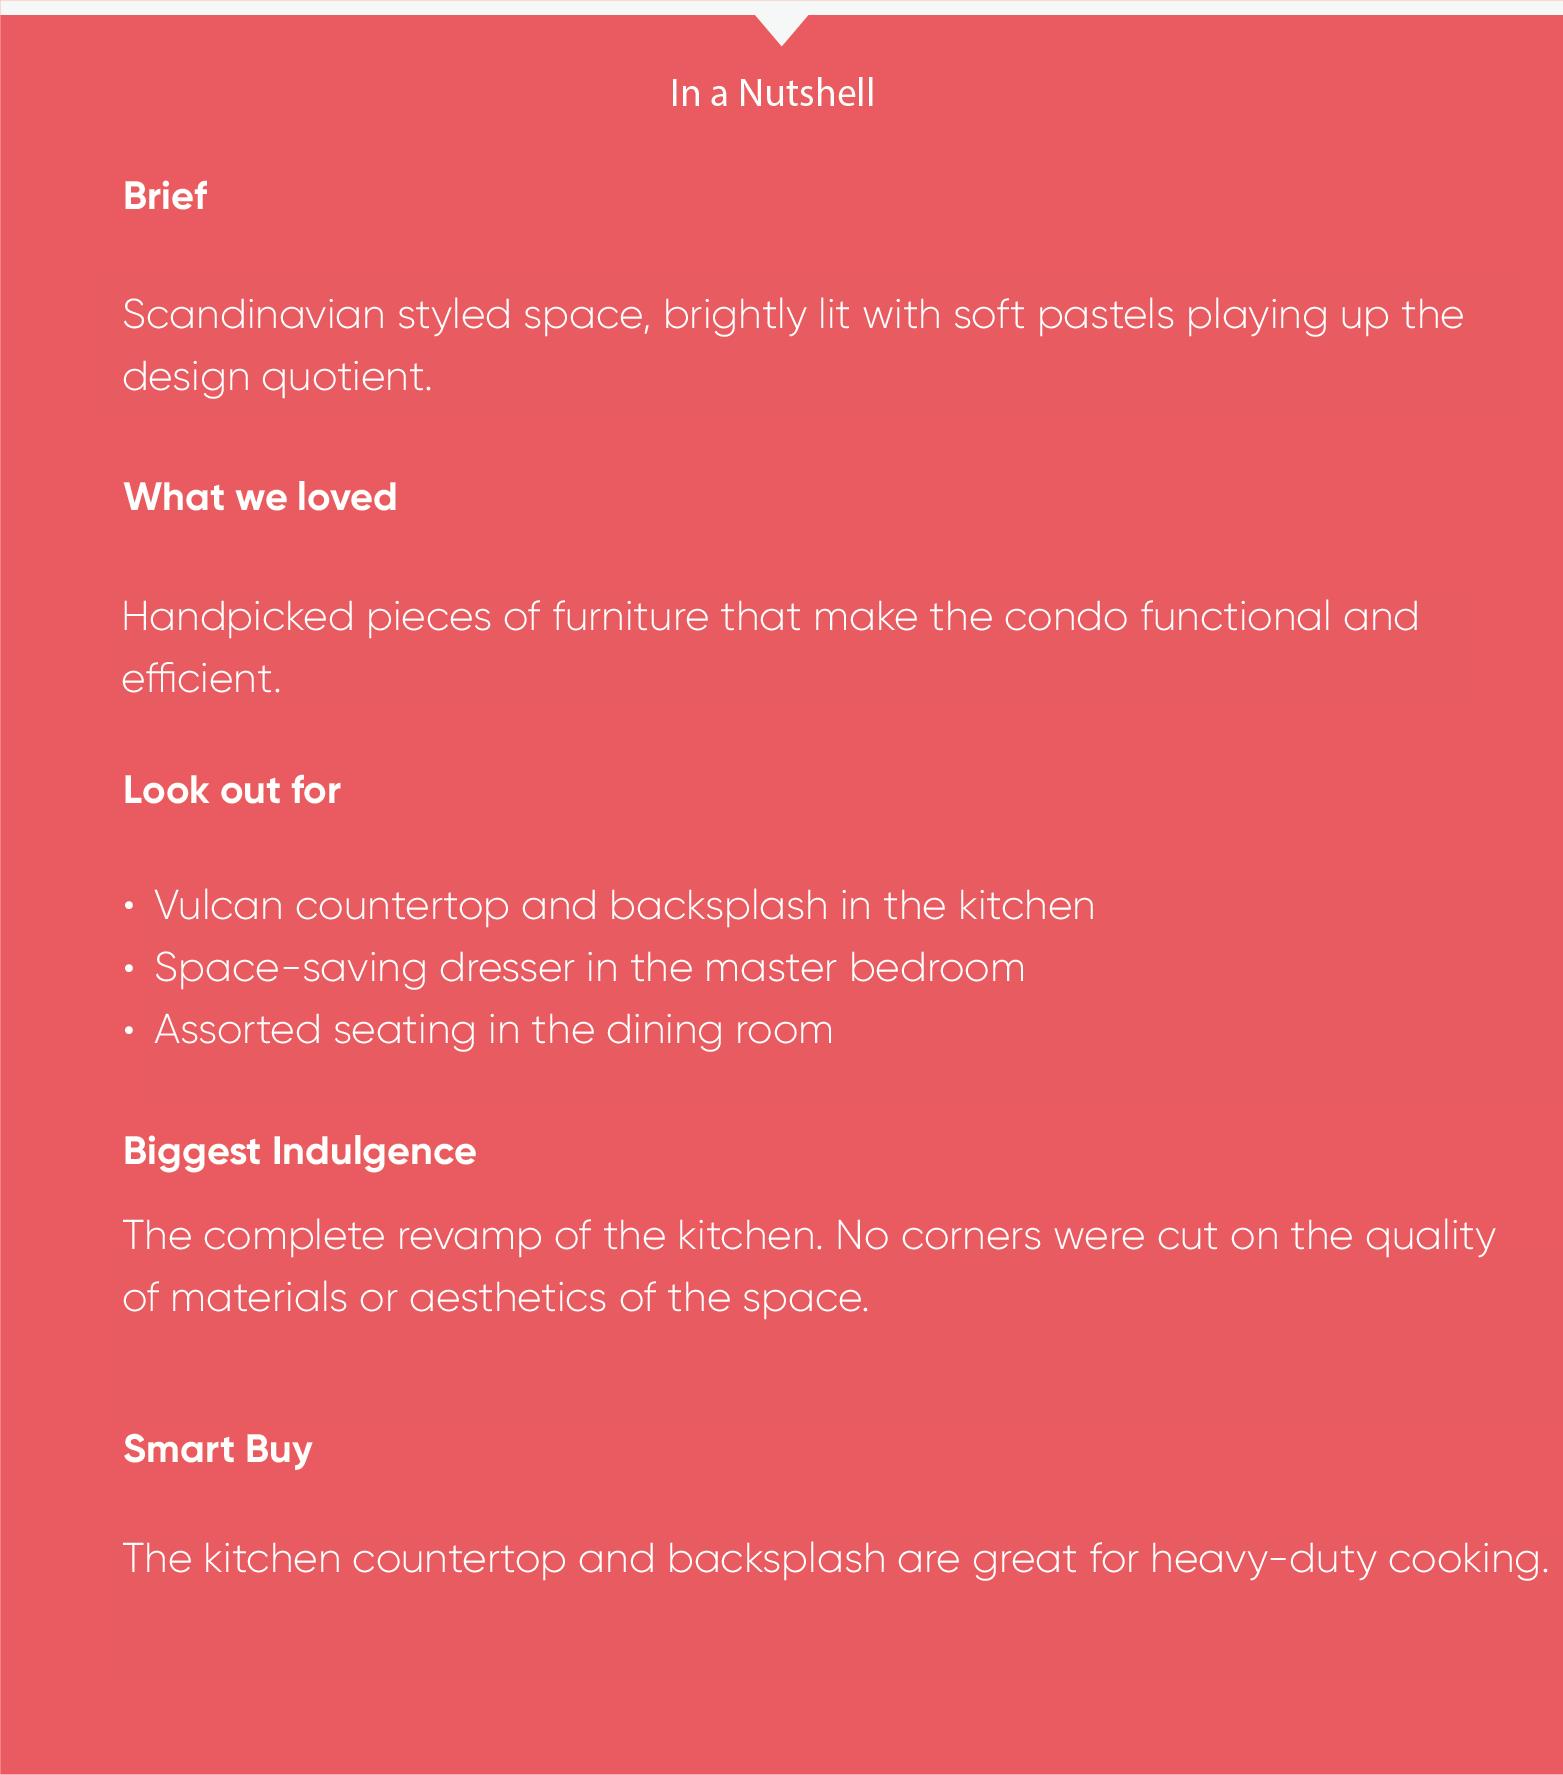 house-interior-design-infobox-client-brief